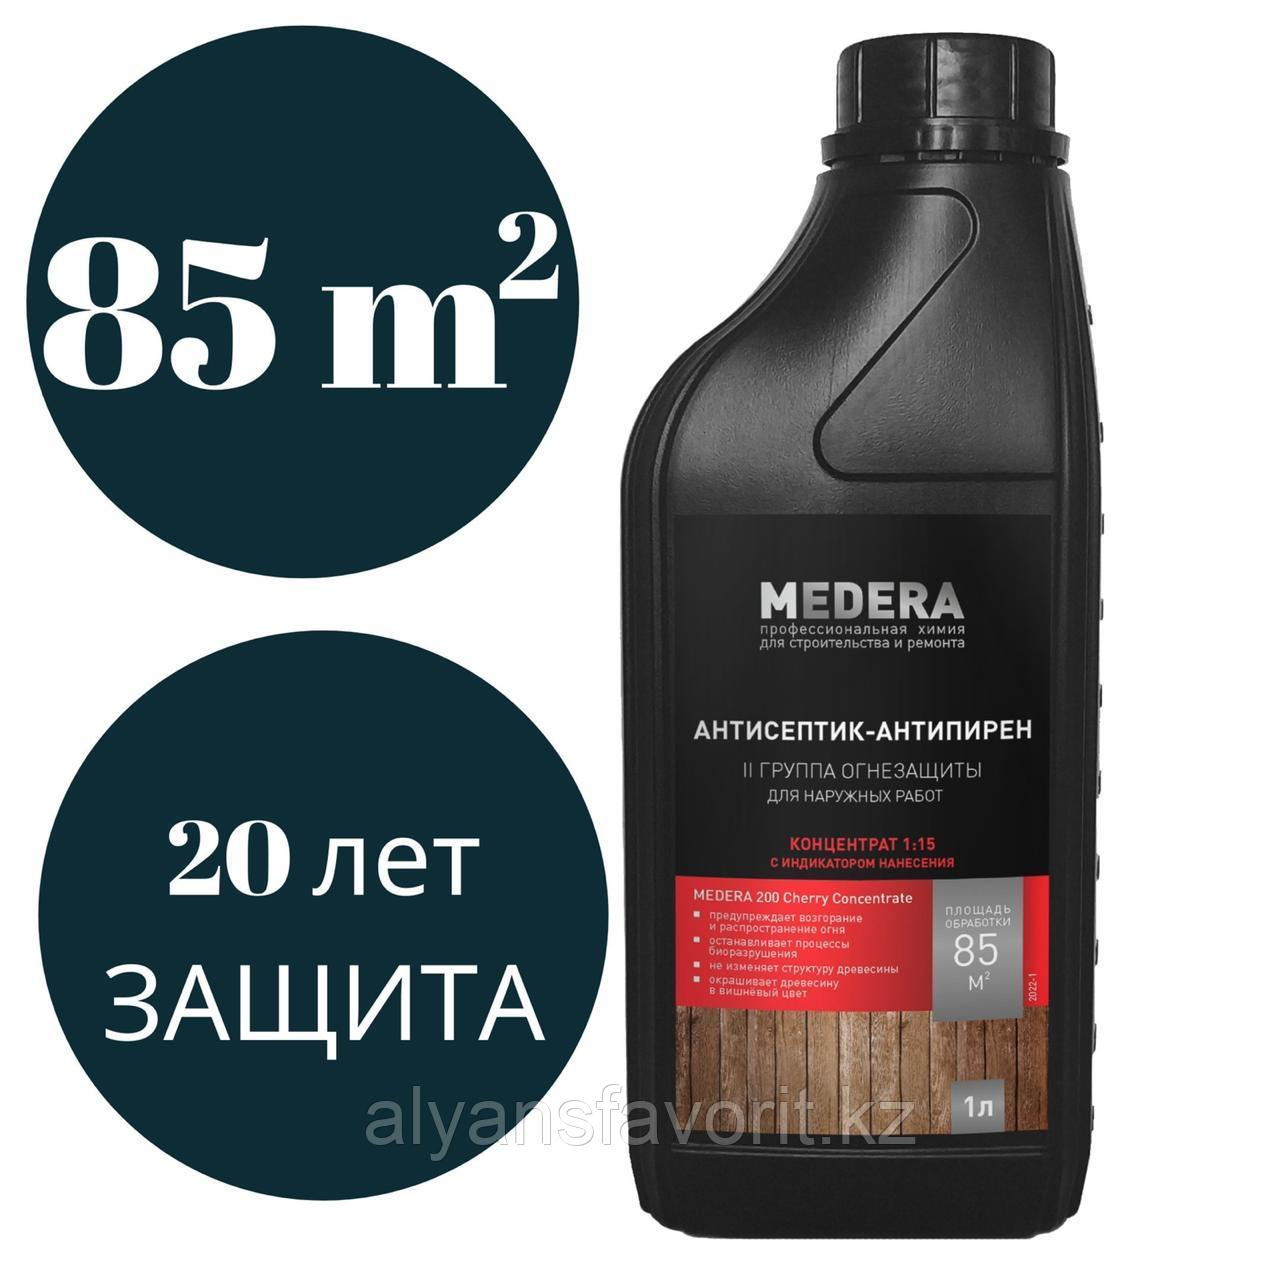 MEDERA 200 - Cherry- пропитка огнебиозащита для древесины II гр. 1 литр.